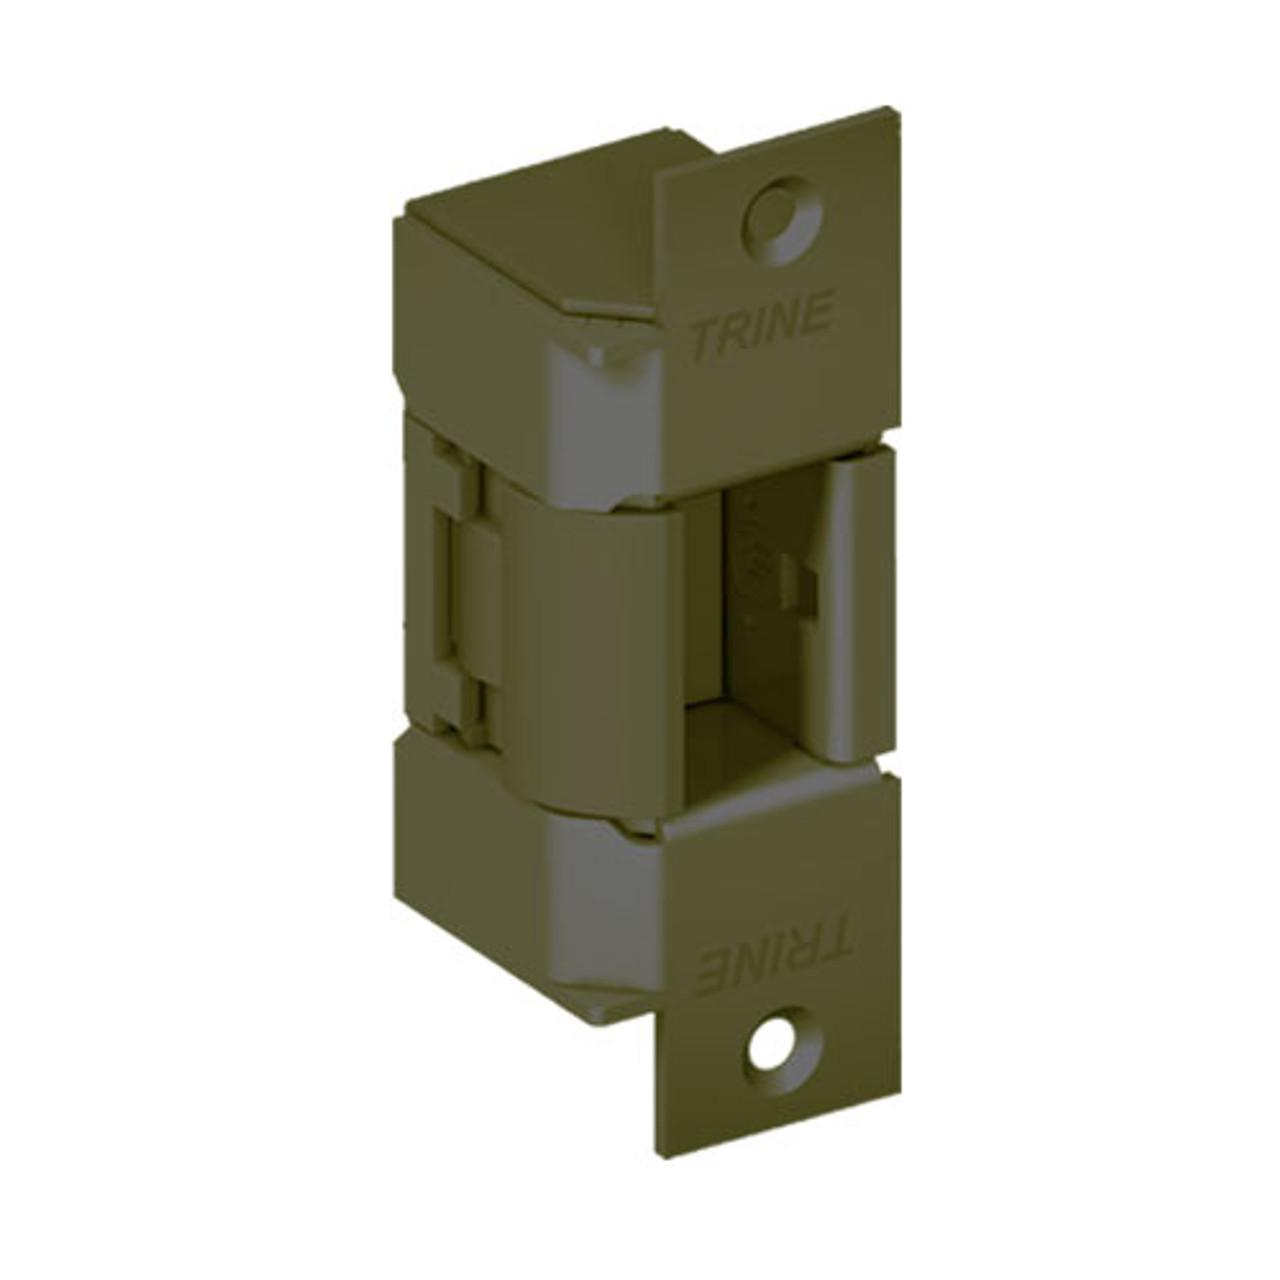 EN400-24DC-US10B-RH Trine EN Series Outdoor Electric Strikes Solution in Dark Bronze Finish